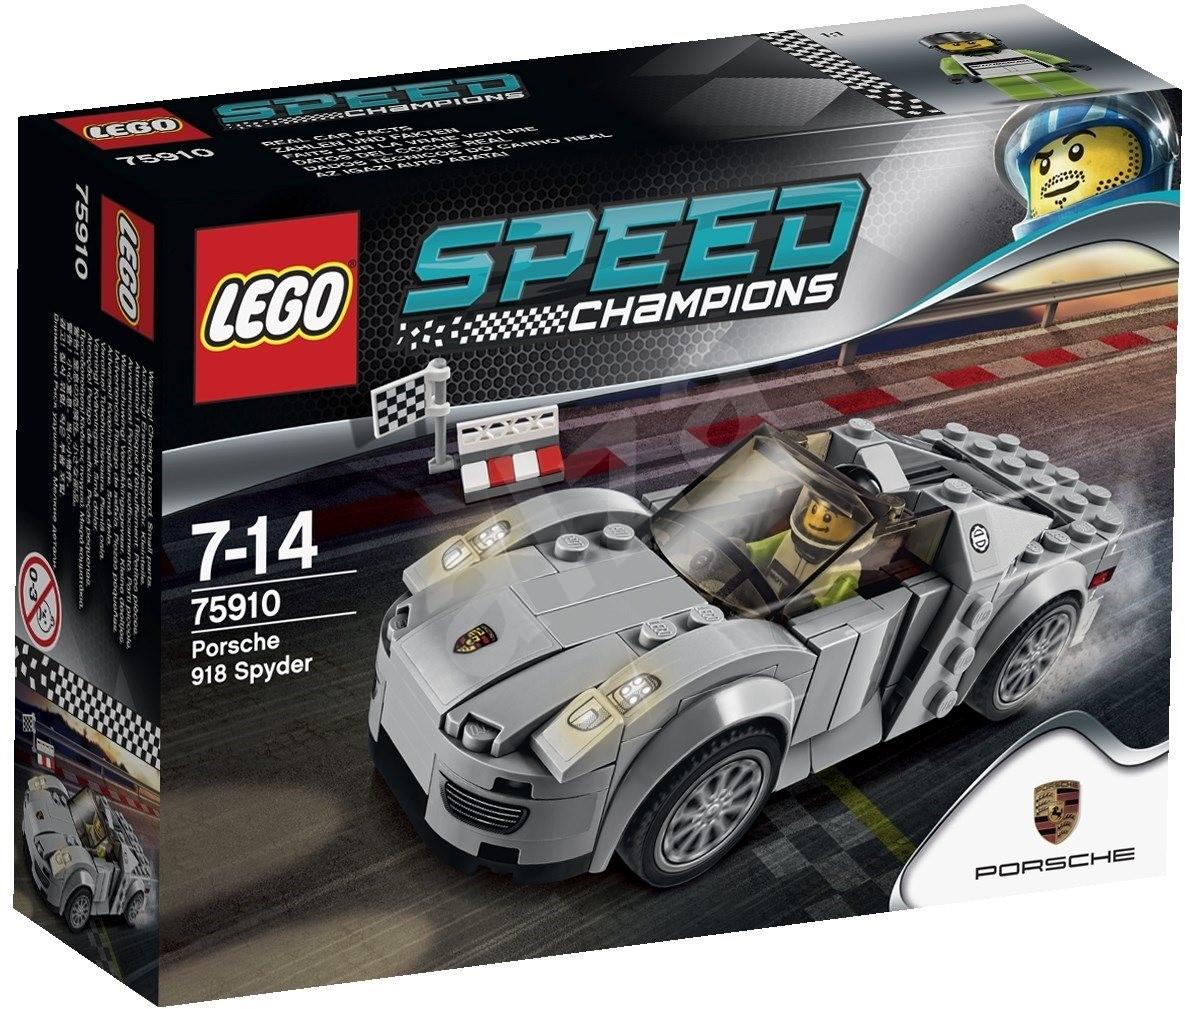 lego speed champions 75910 porsche 918 spyder building kit. Black Bedroom Furniture Sets. Home Design Ideas